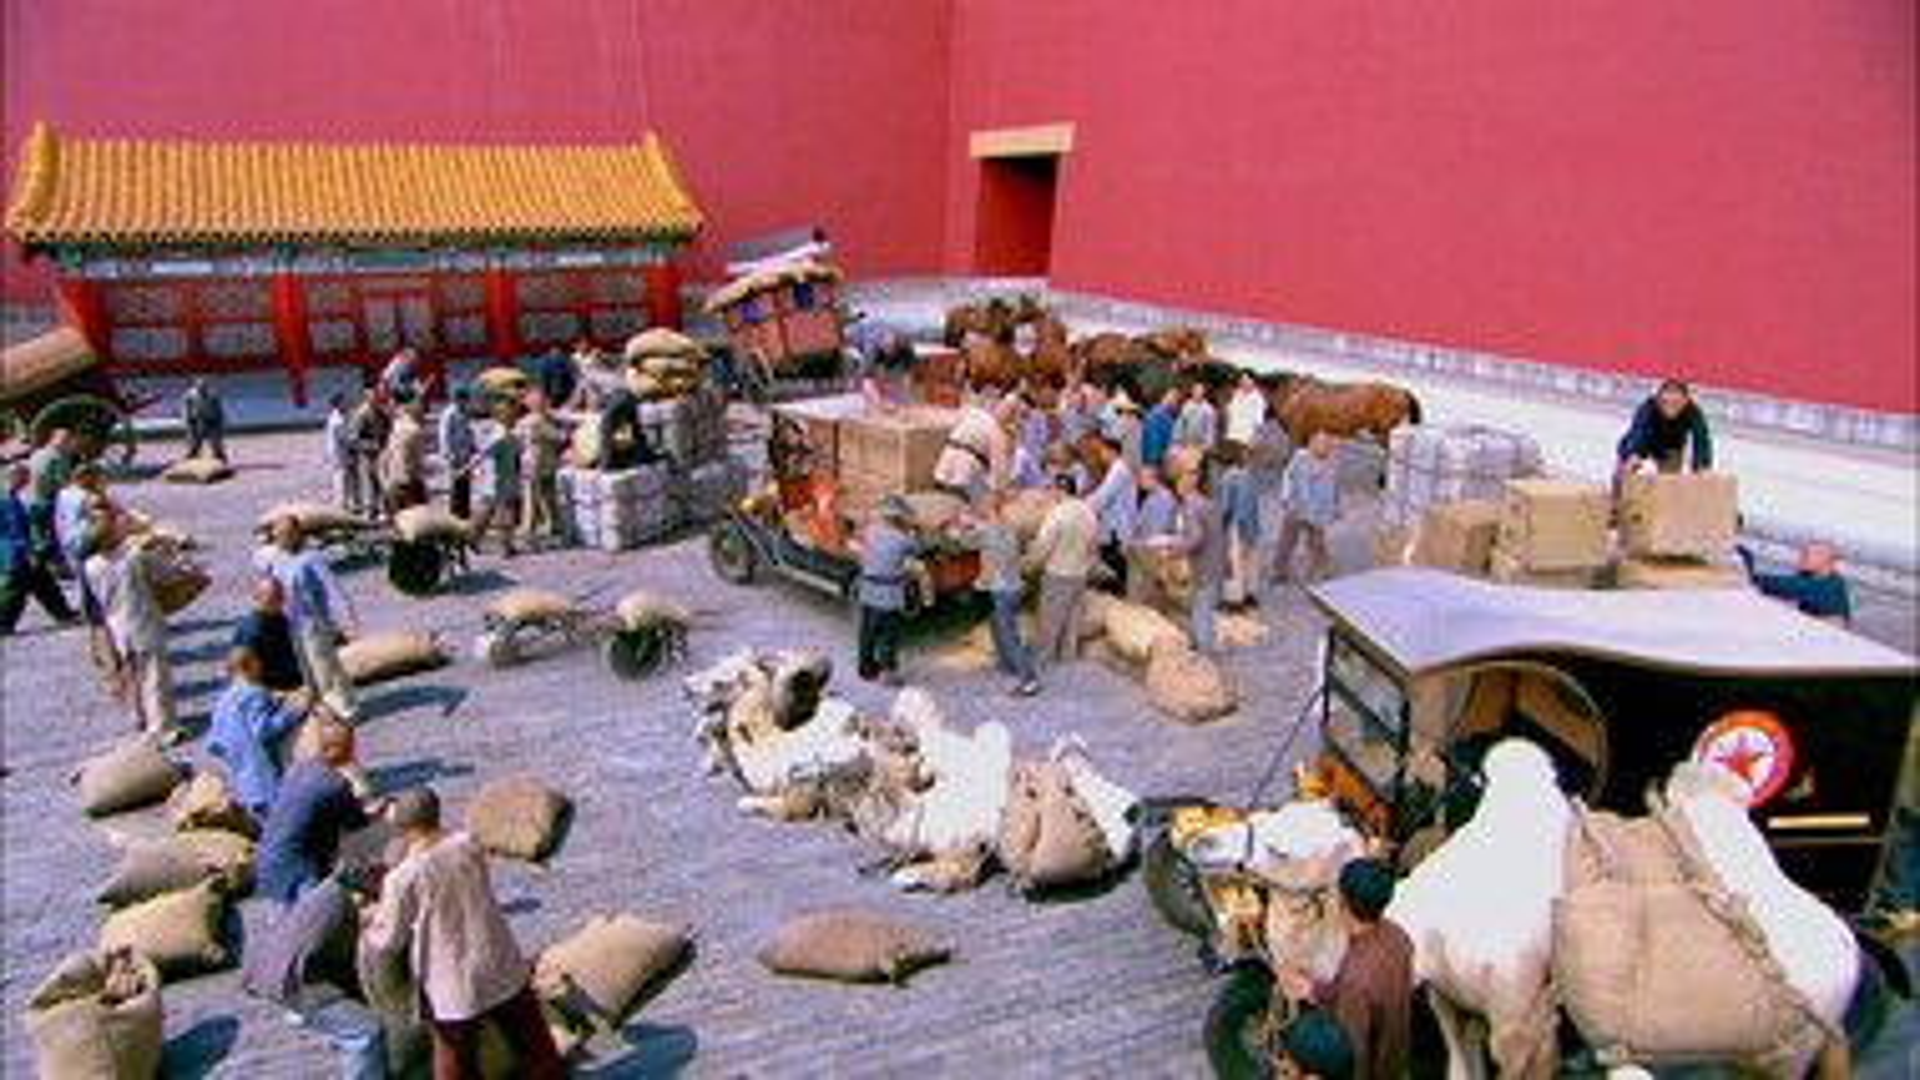 New Moment in Peking Episode 1